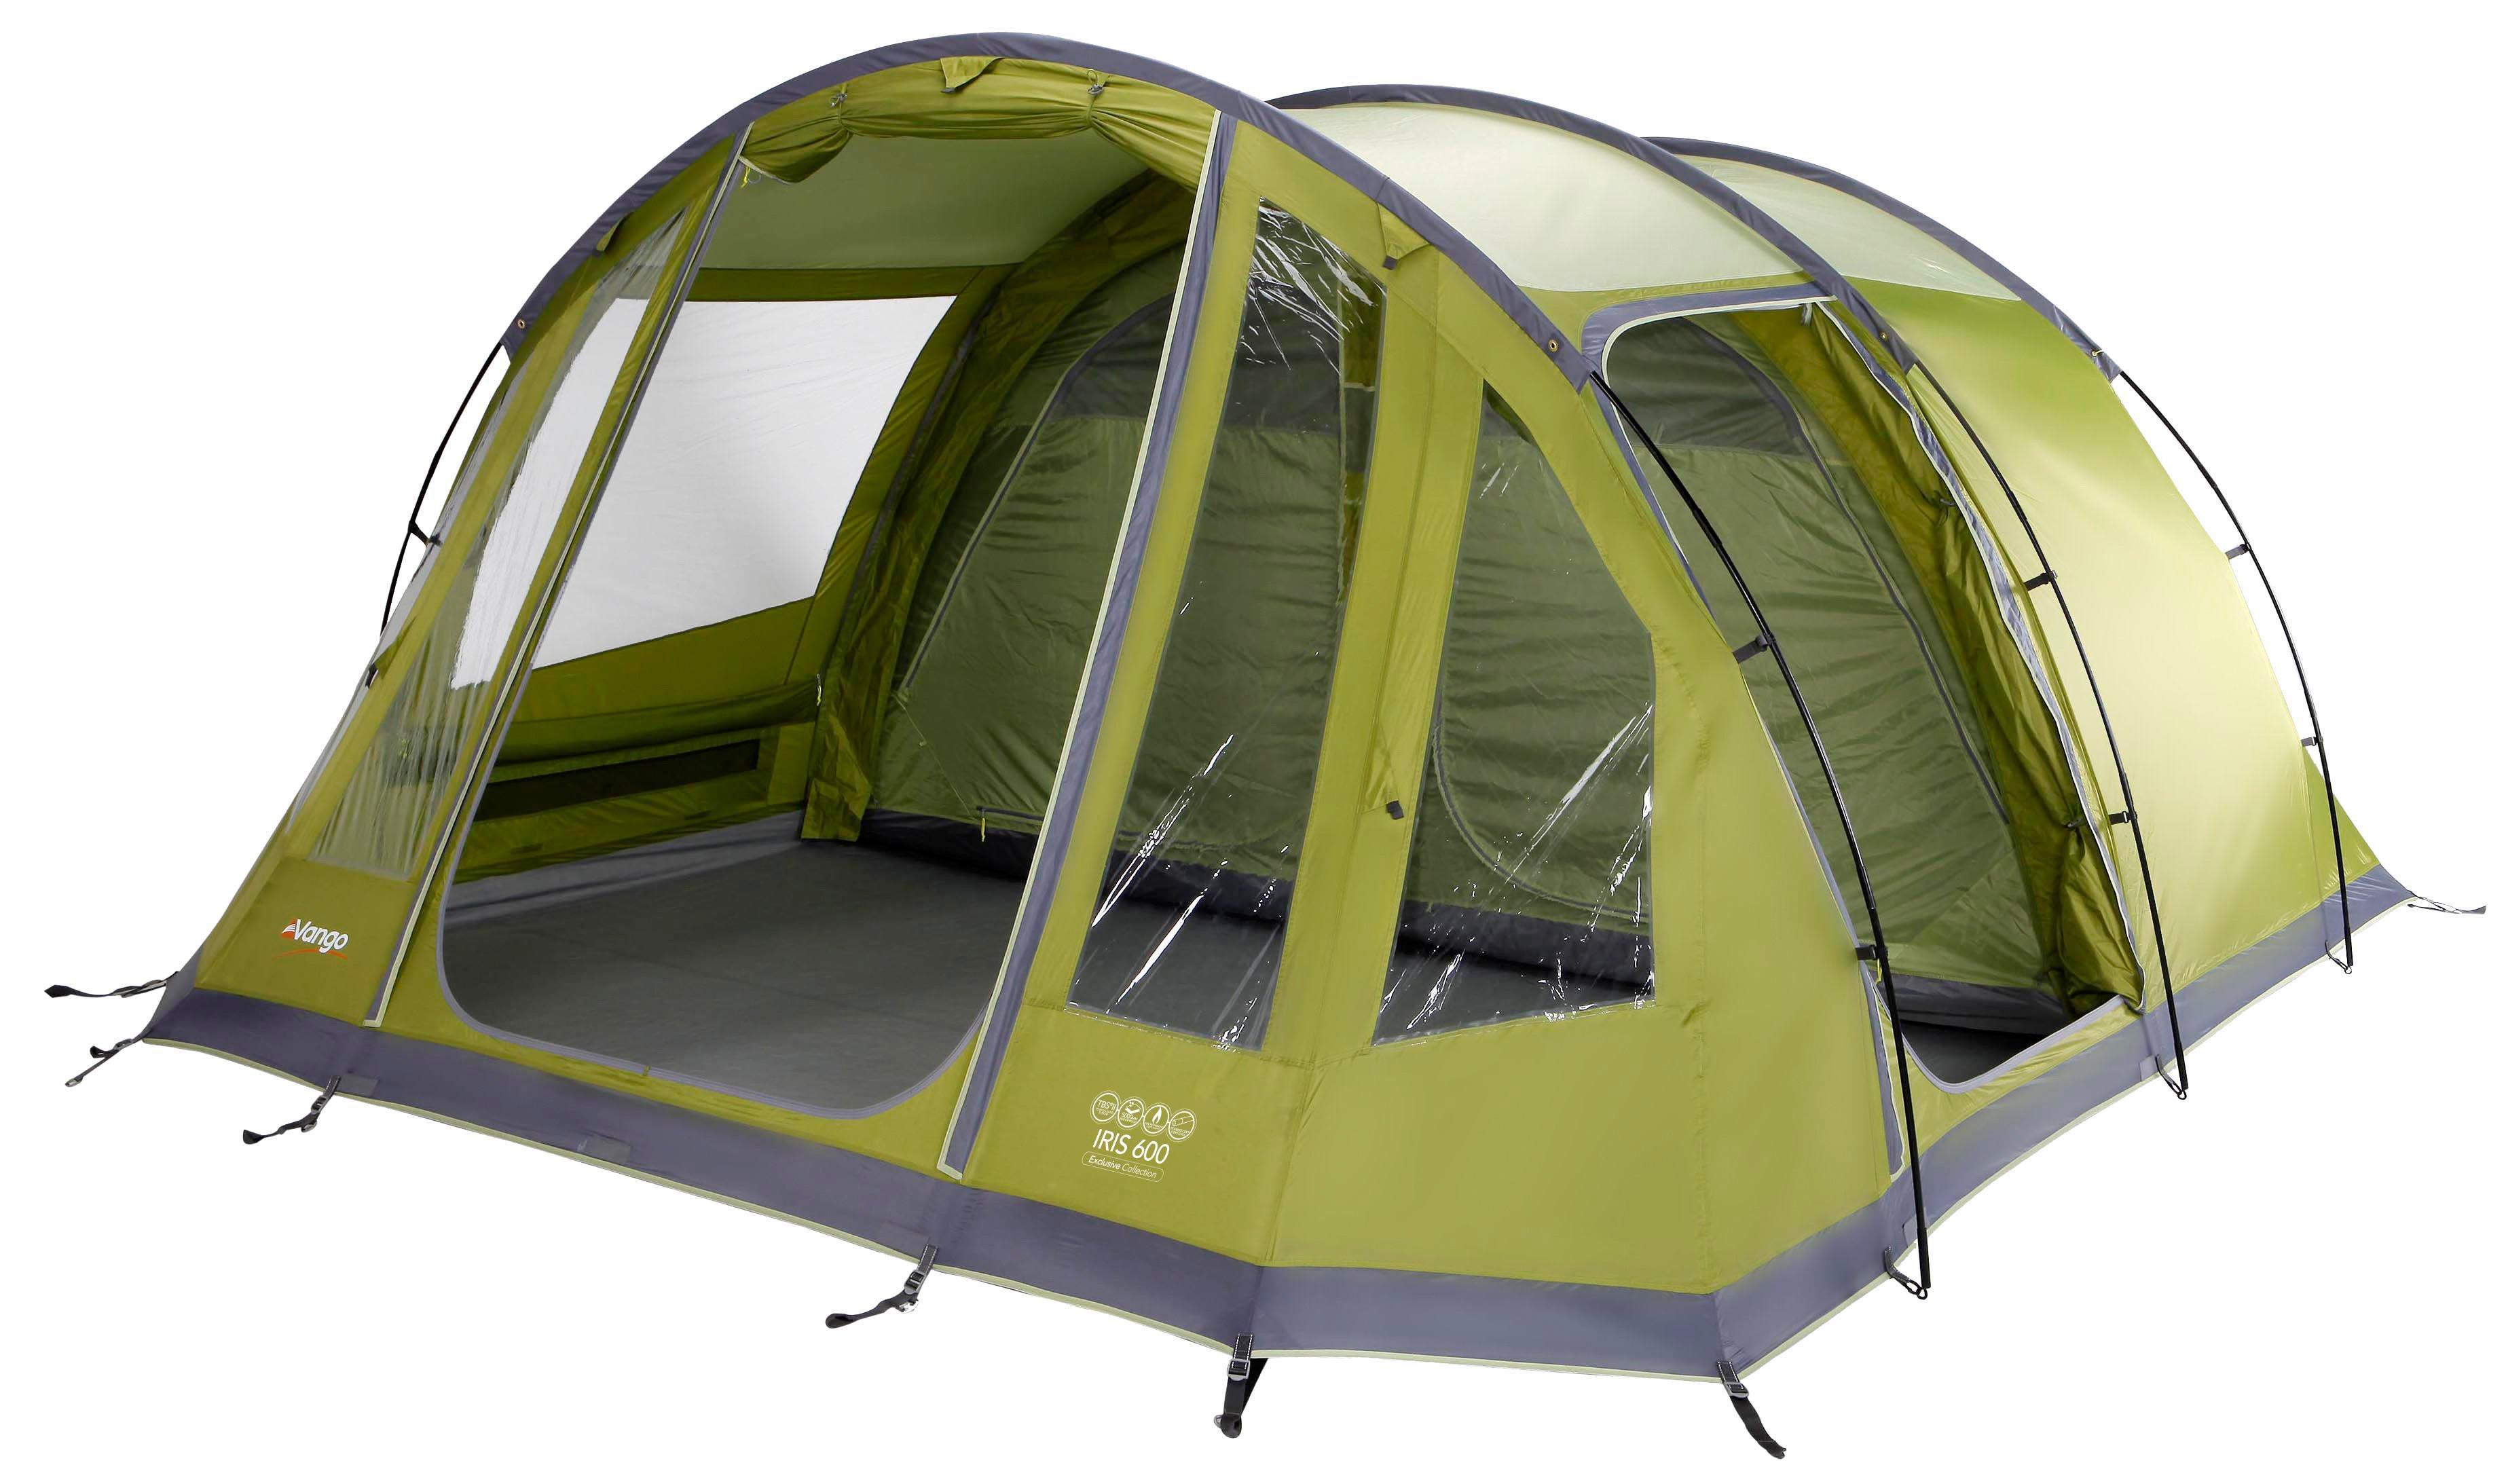 top vango iris person tent with vango 4 man tent  sc 1 st  gladtobehome.us & Vango 4 Man Tent. Affordable Vango 4 Man Tent With Vango 4 Man ...